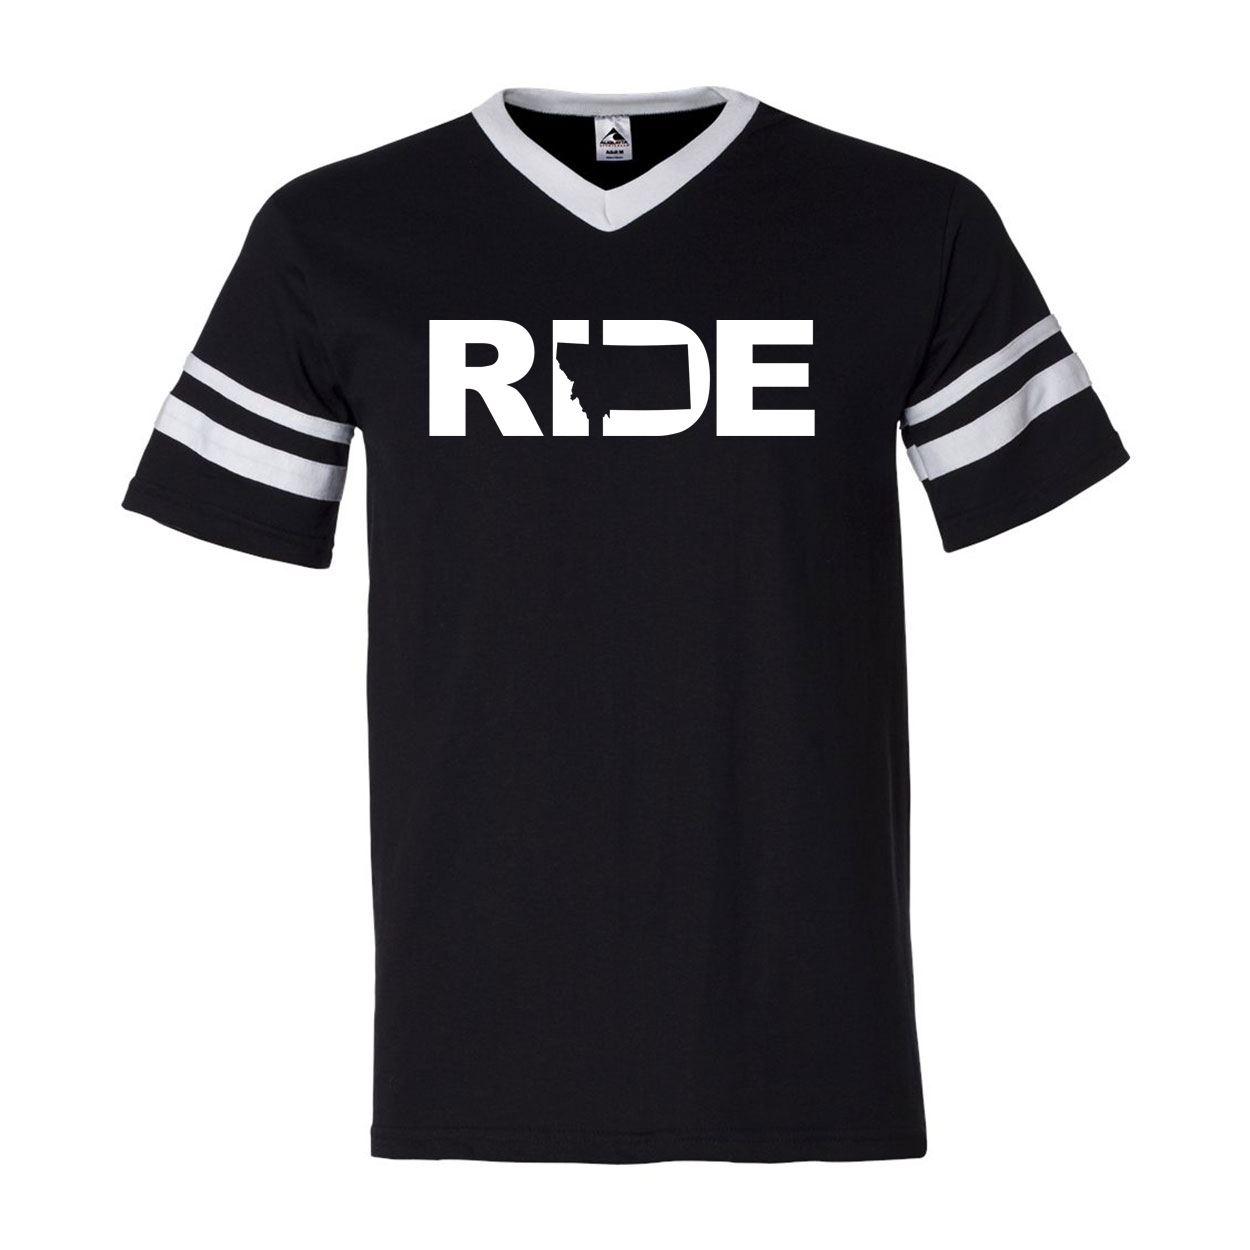 Ride Montana Classic Premium Striped Jersey T-Shirt Black/White (White Logo)